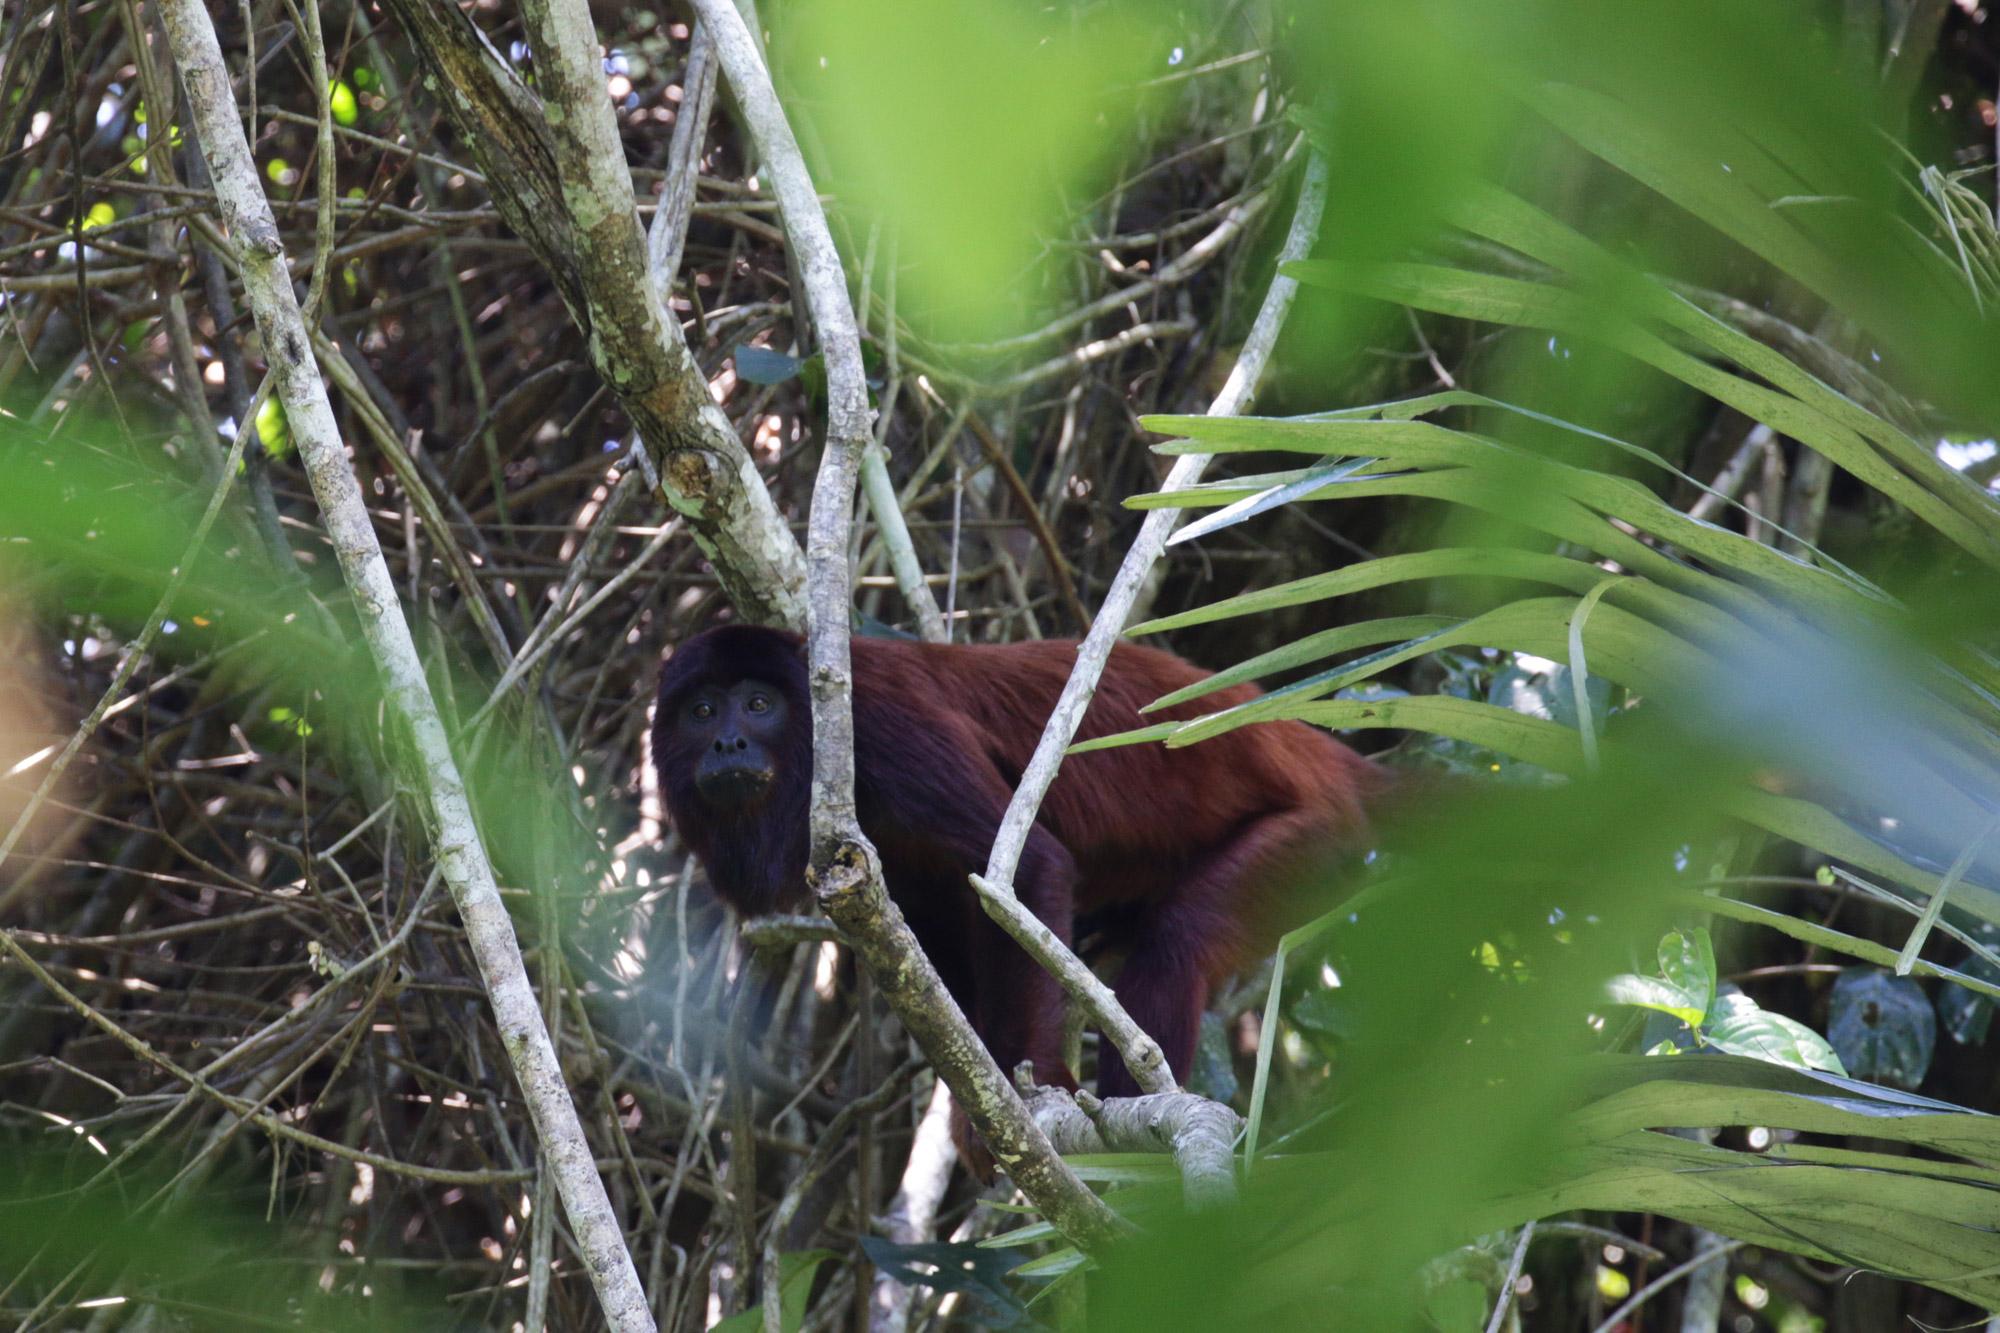 Beste plekken in Bolivia om wildlife te spotten: Madidi